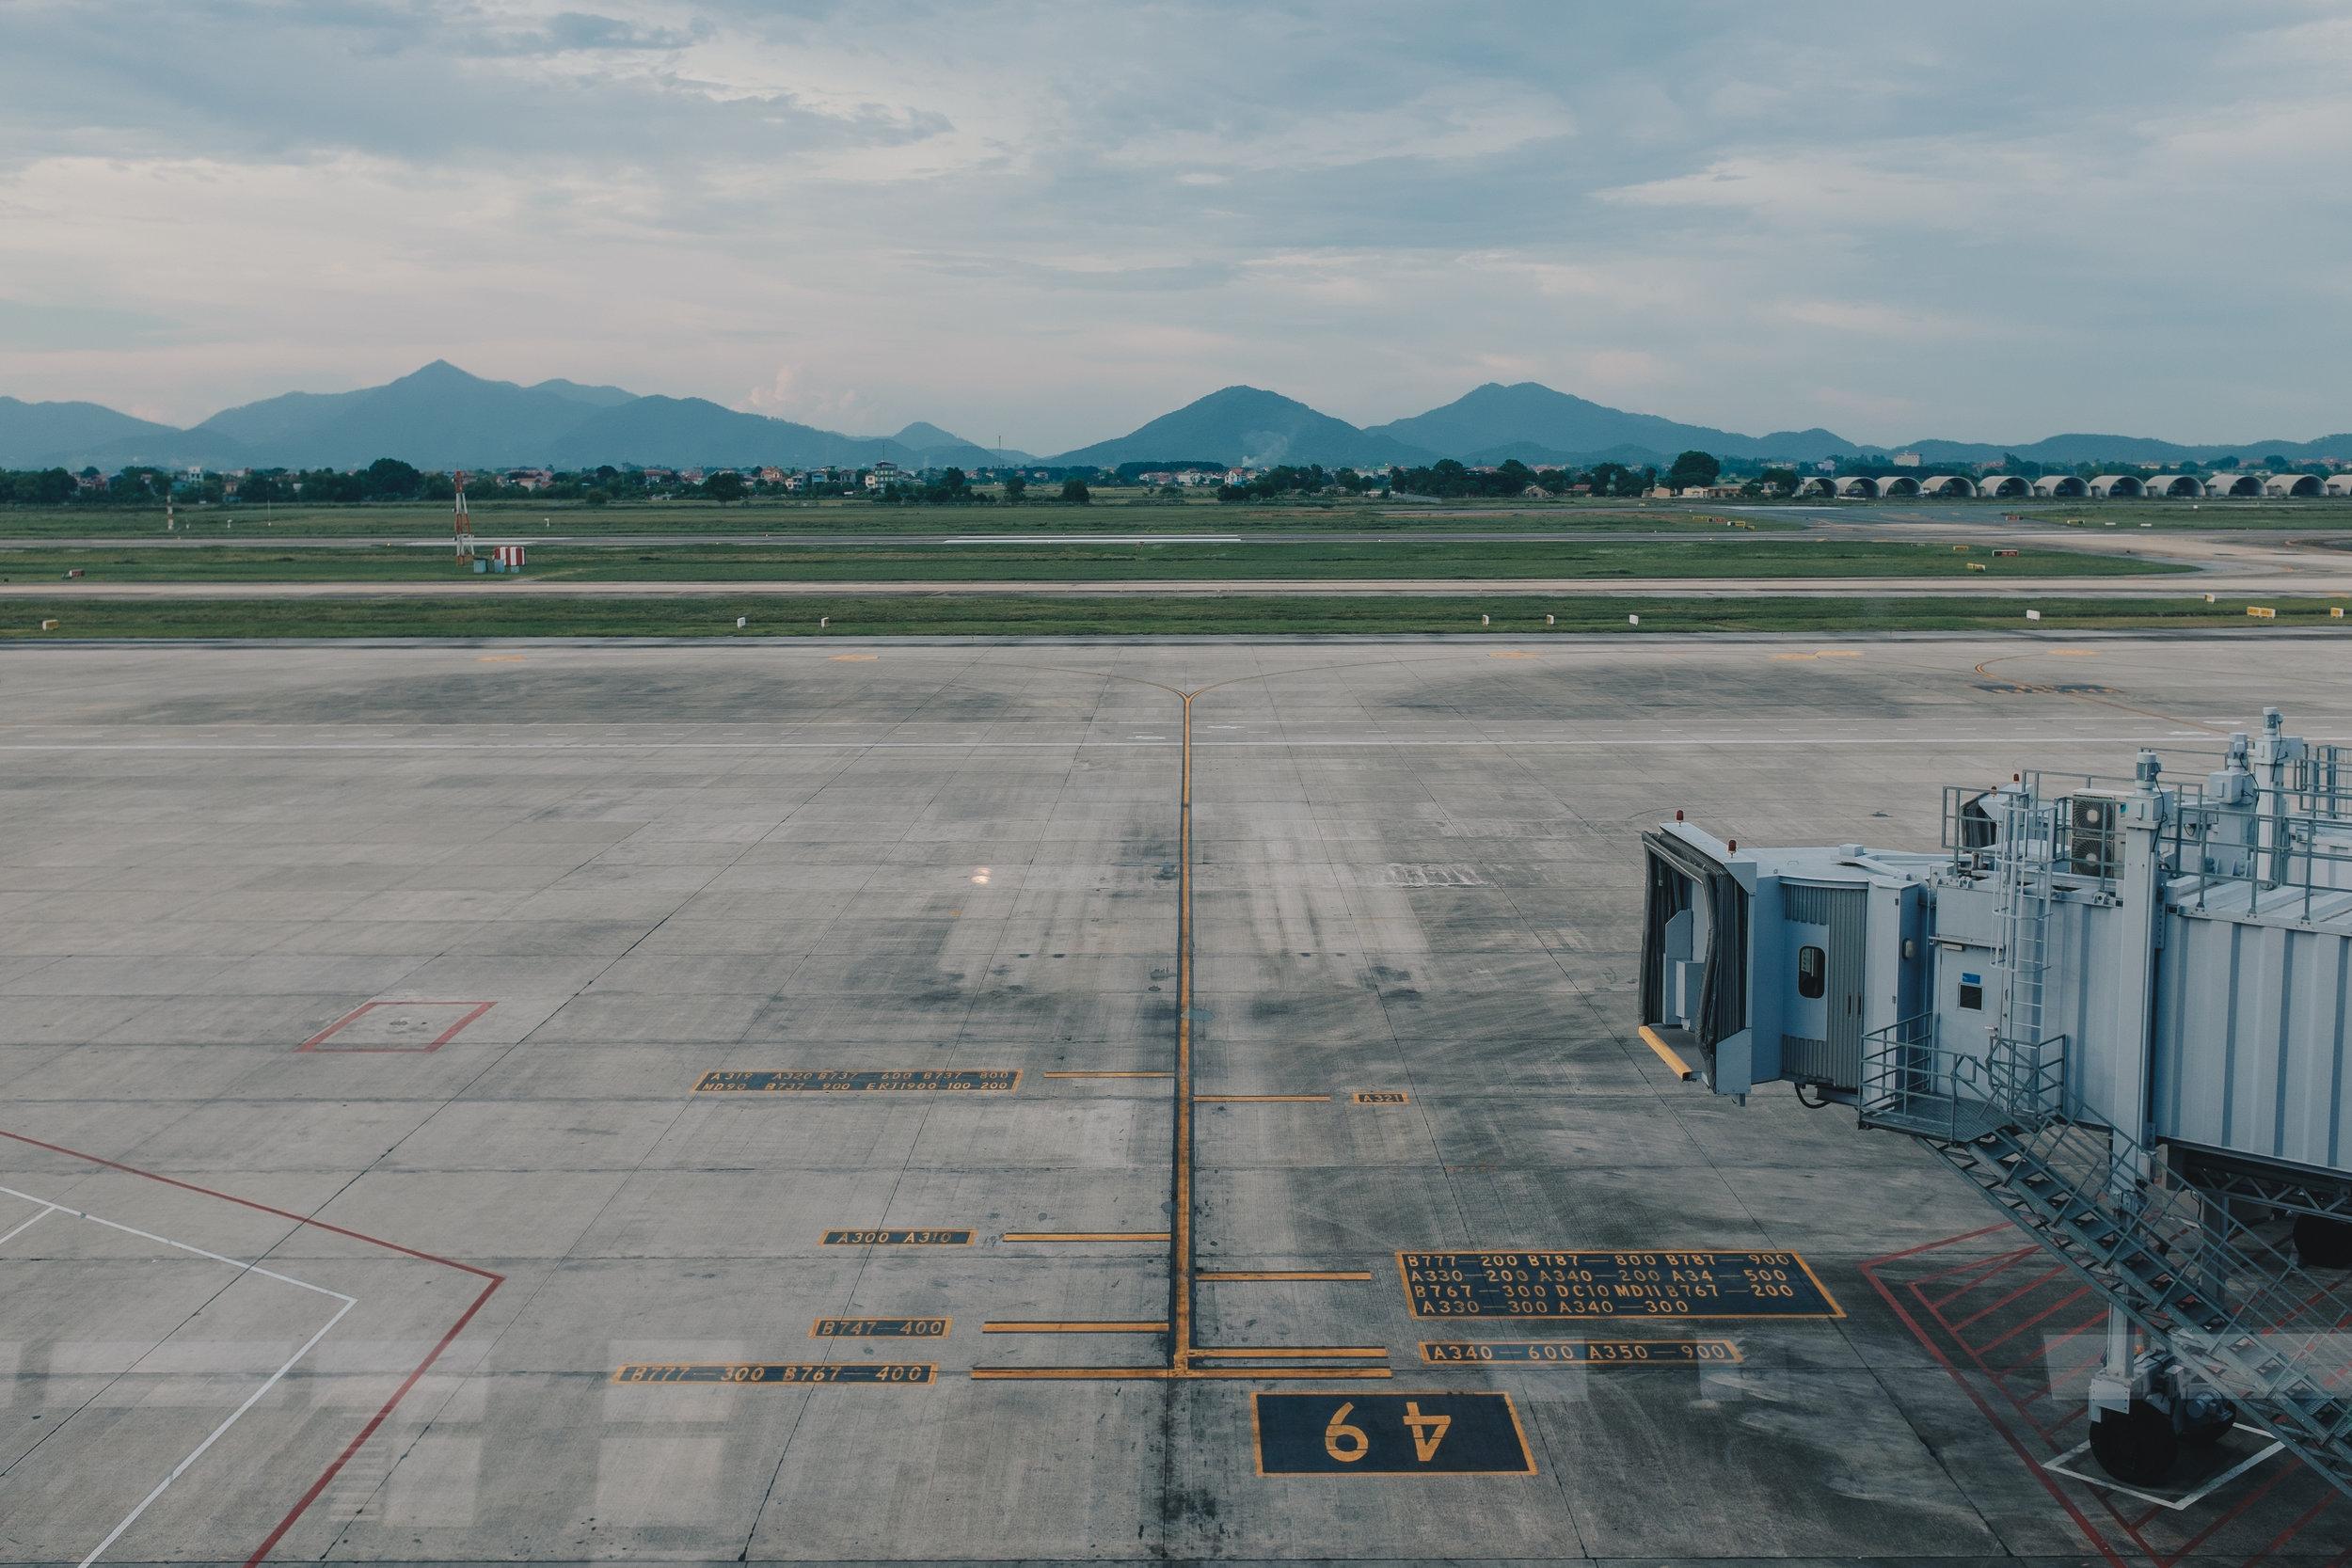 Waiting for my flight home at Hanoi's Noi Bai International Airport